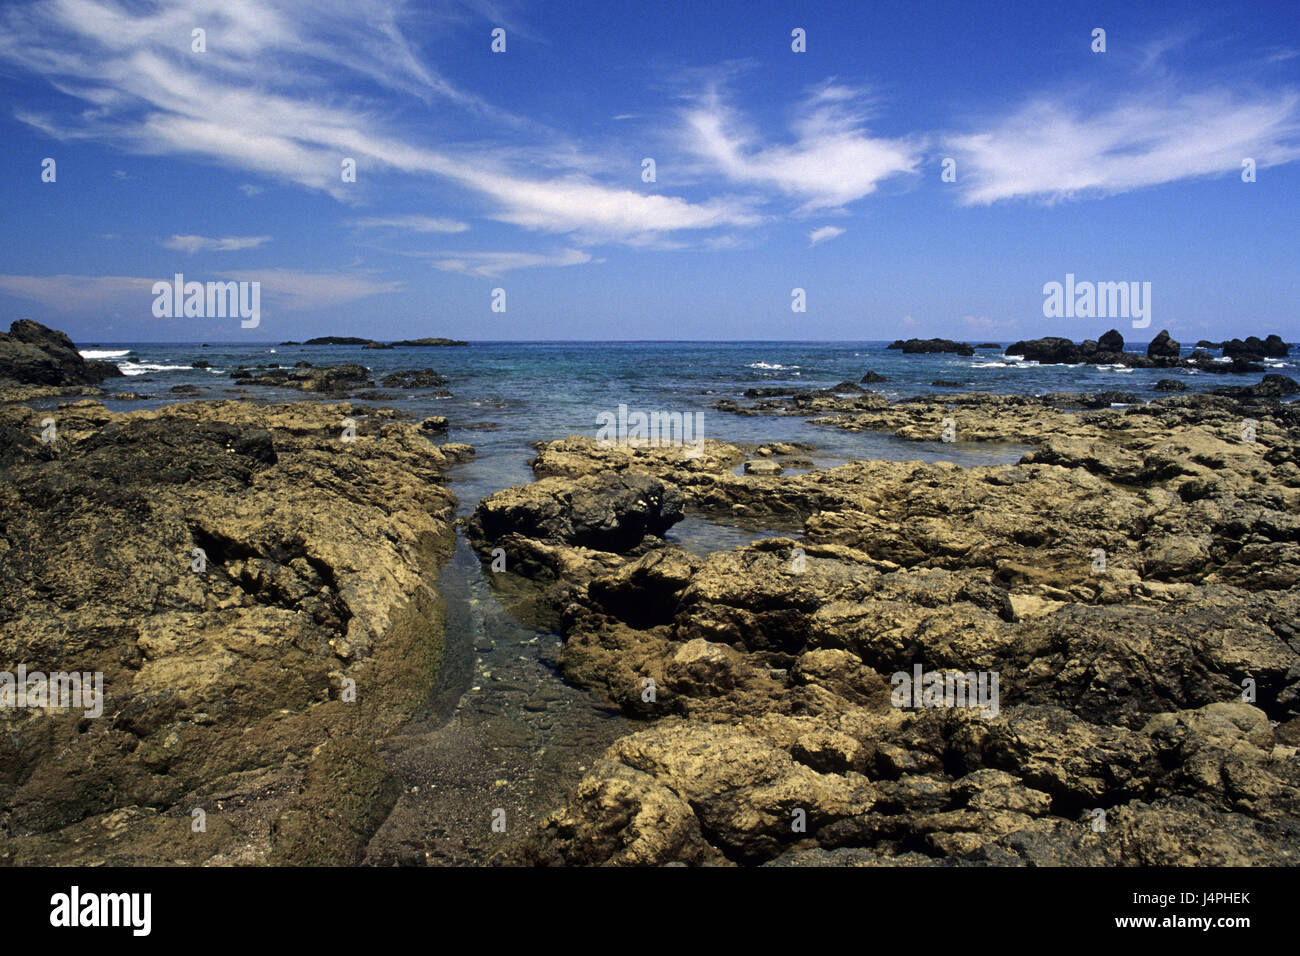 Costa Rica, Peninsula de Osa, sea, - Stock Image